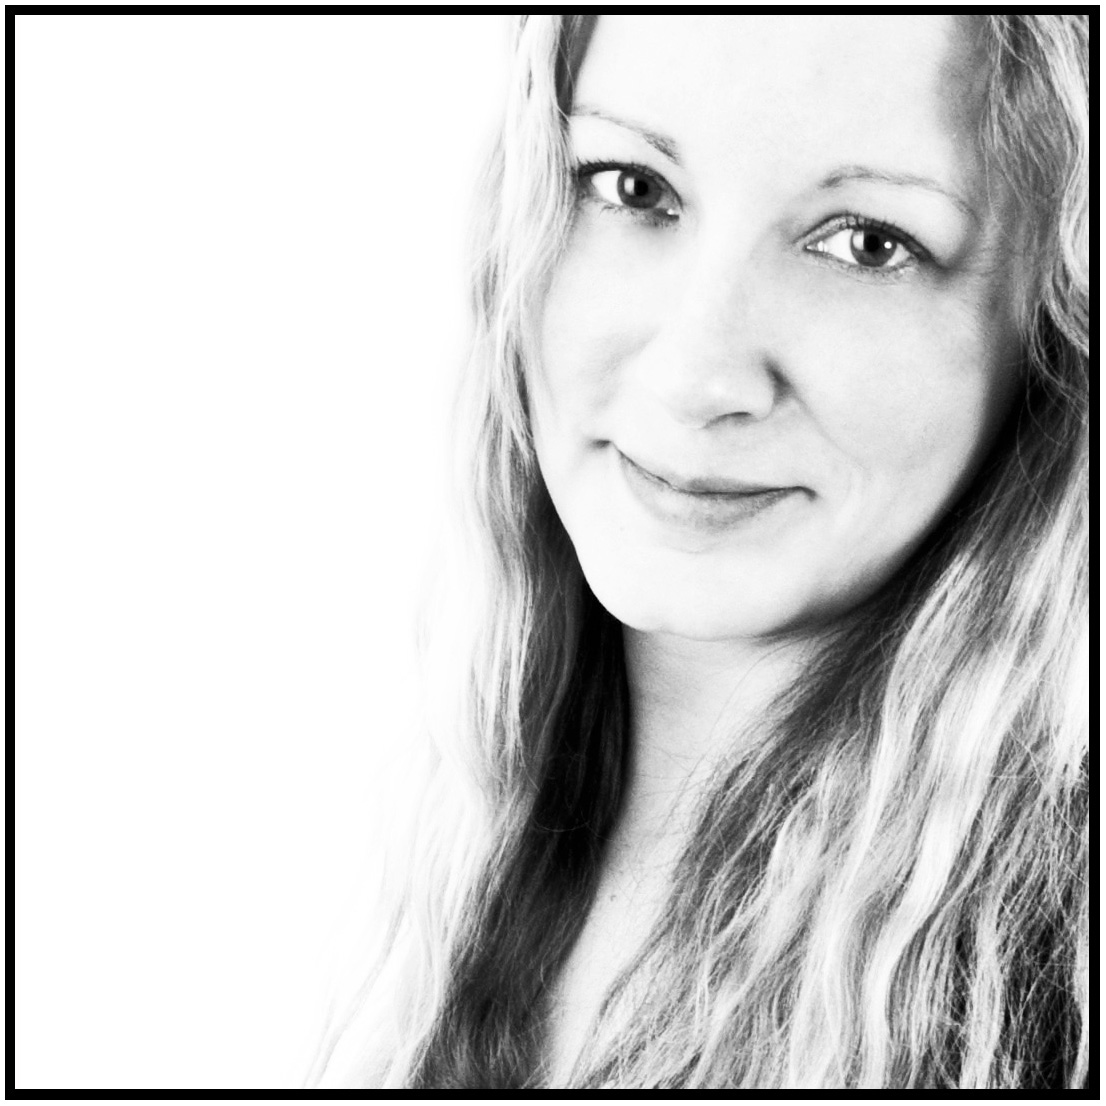 DSC_6112 - 2 - Website photo of Sarah